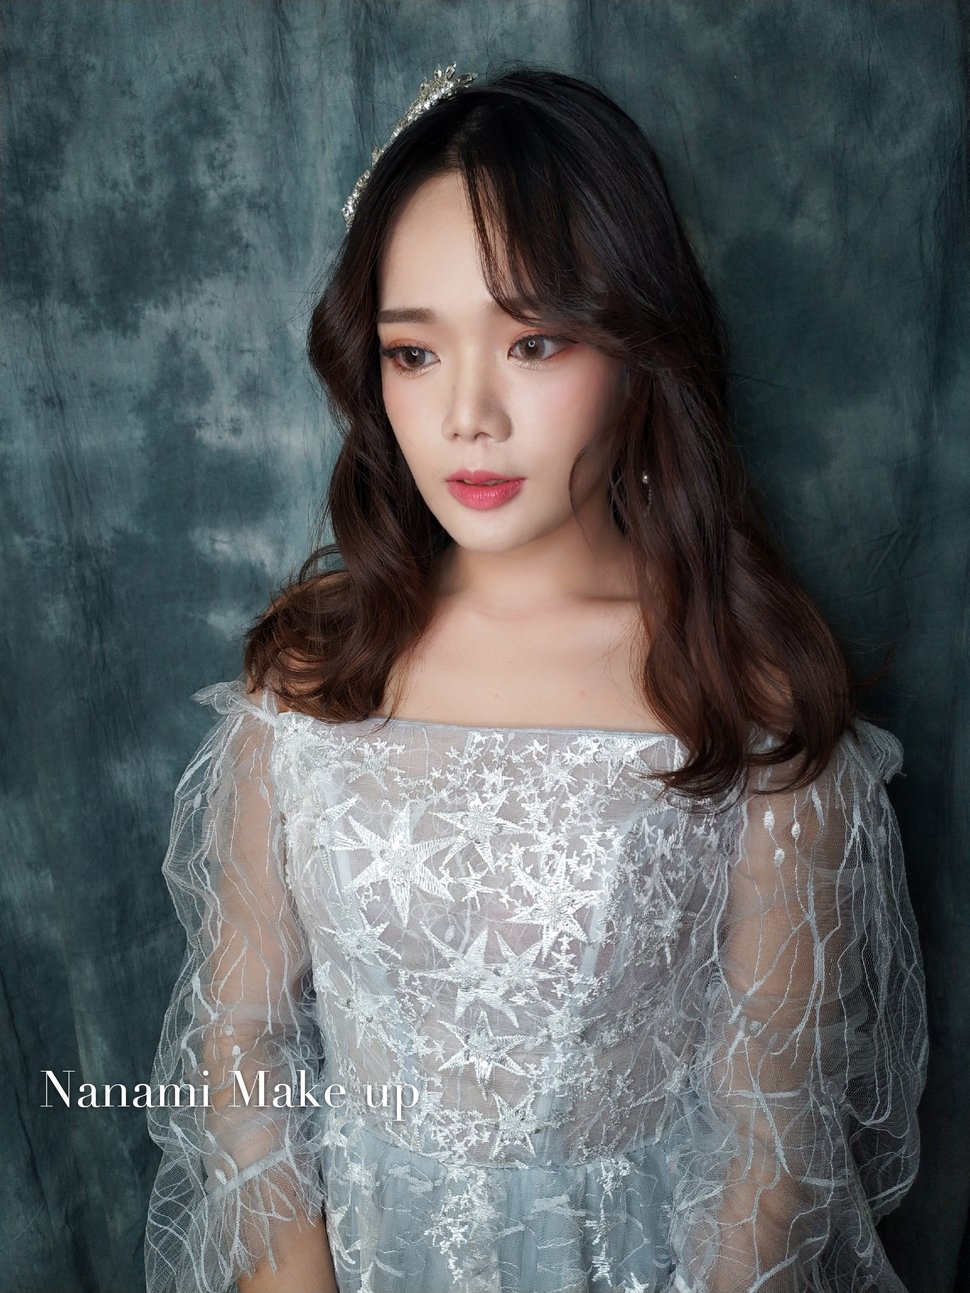 384A8252-52B5-401F-A713-7B9876786635 - Nanami 張慈慈《結婚吧》